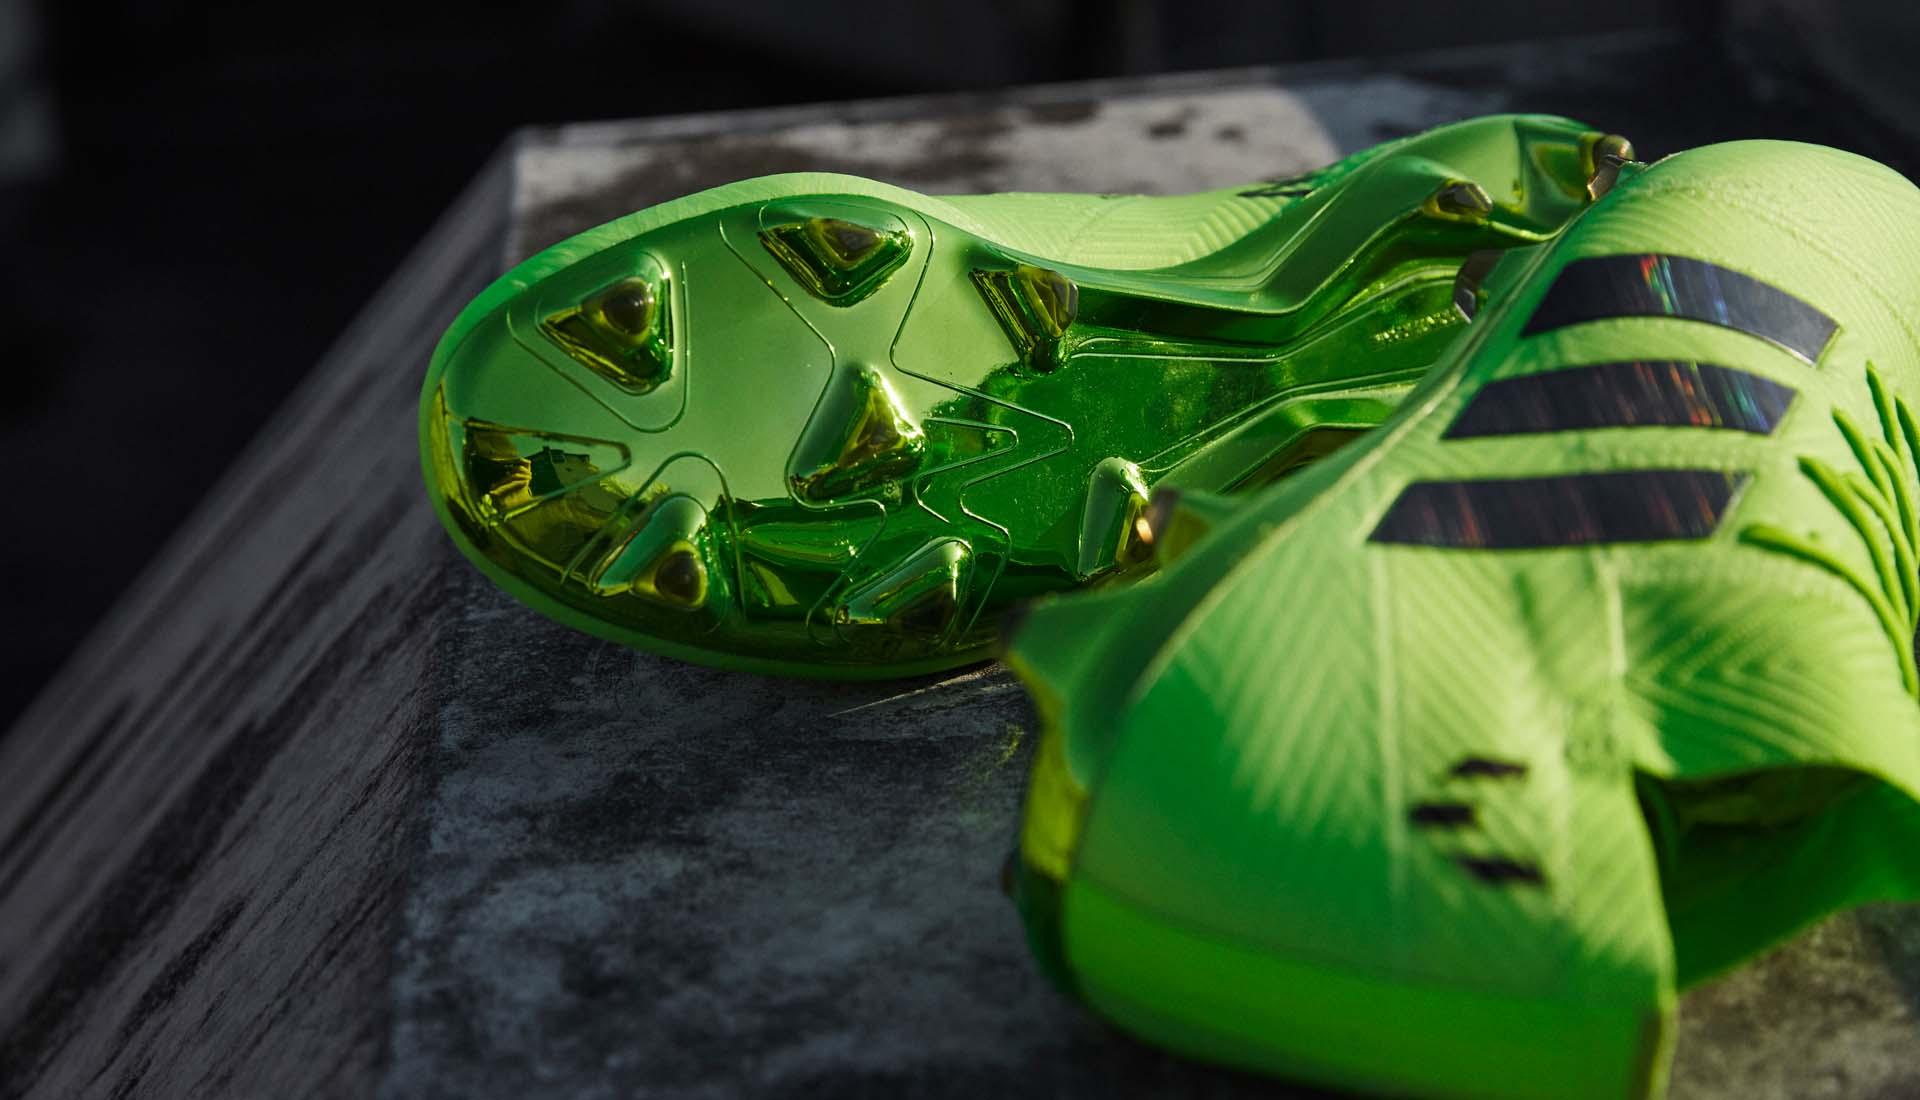 7-adidas-nemeziz-messi-energy-mode.jpg